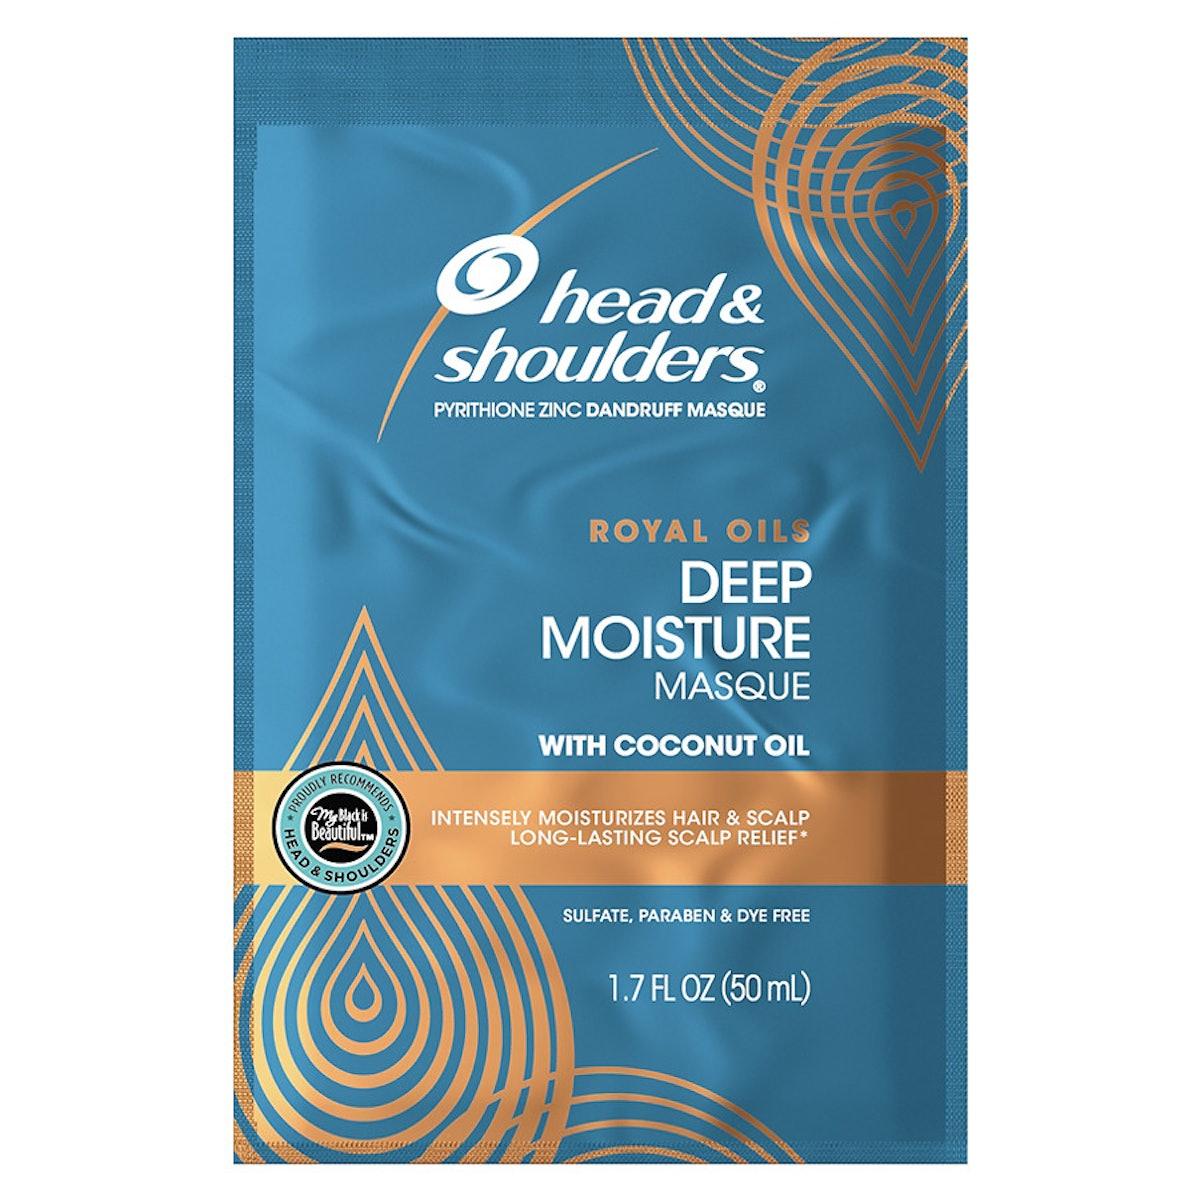 Royal Oils Deep Moisture Masque Conditioner